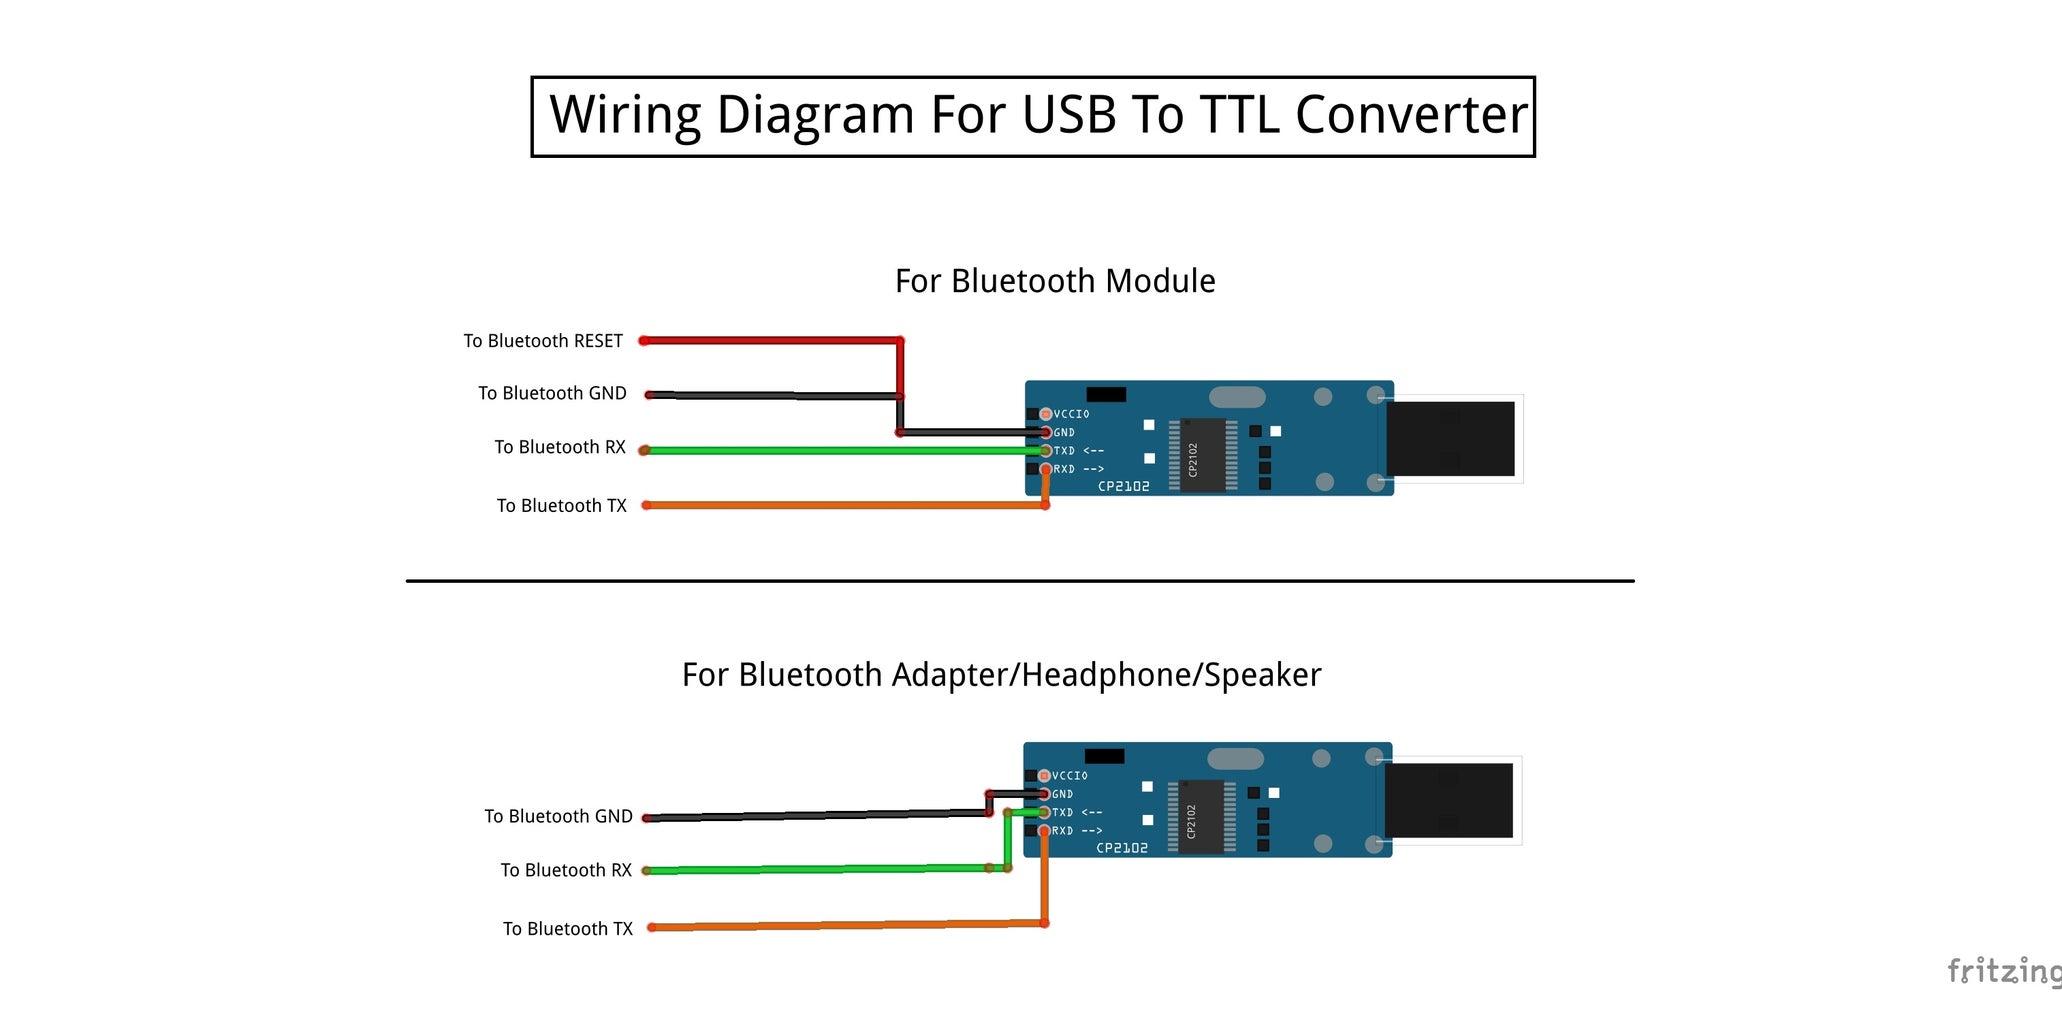 Wiring the Bluetooth Board (USB to TTL Converter Method)